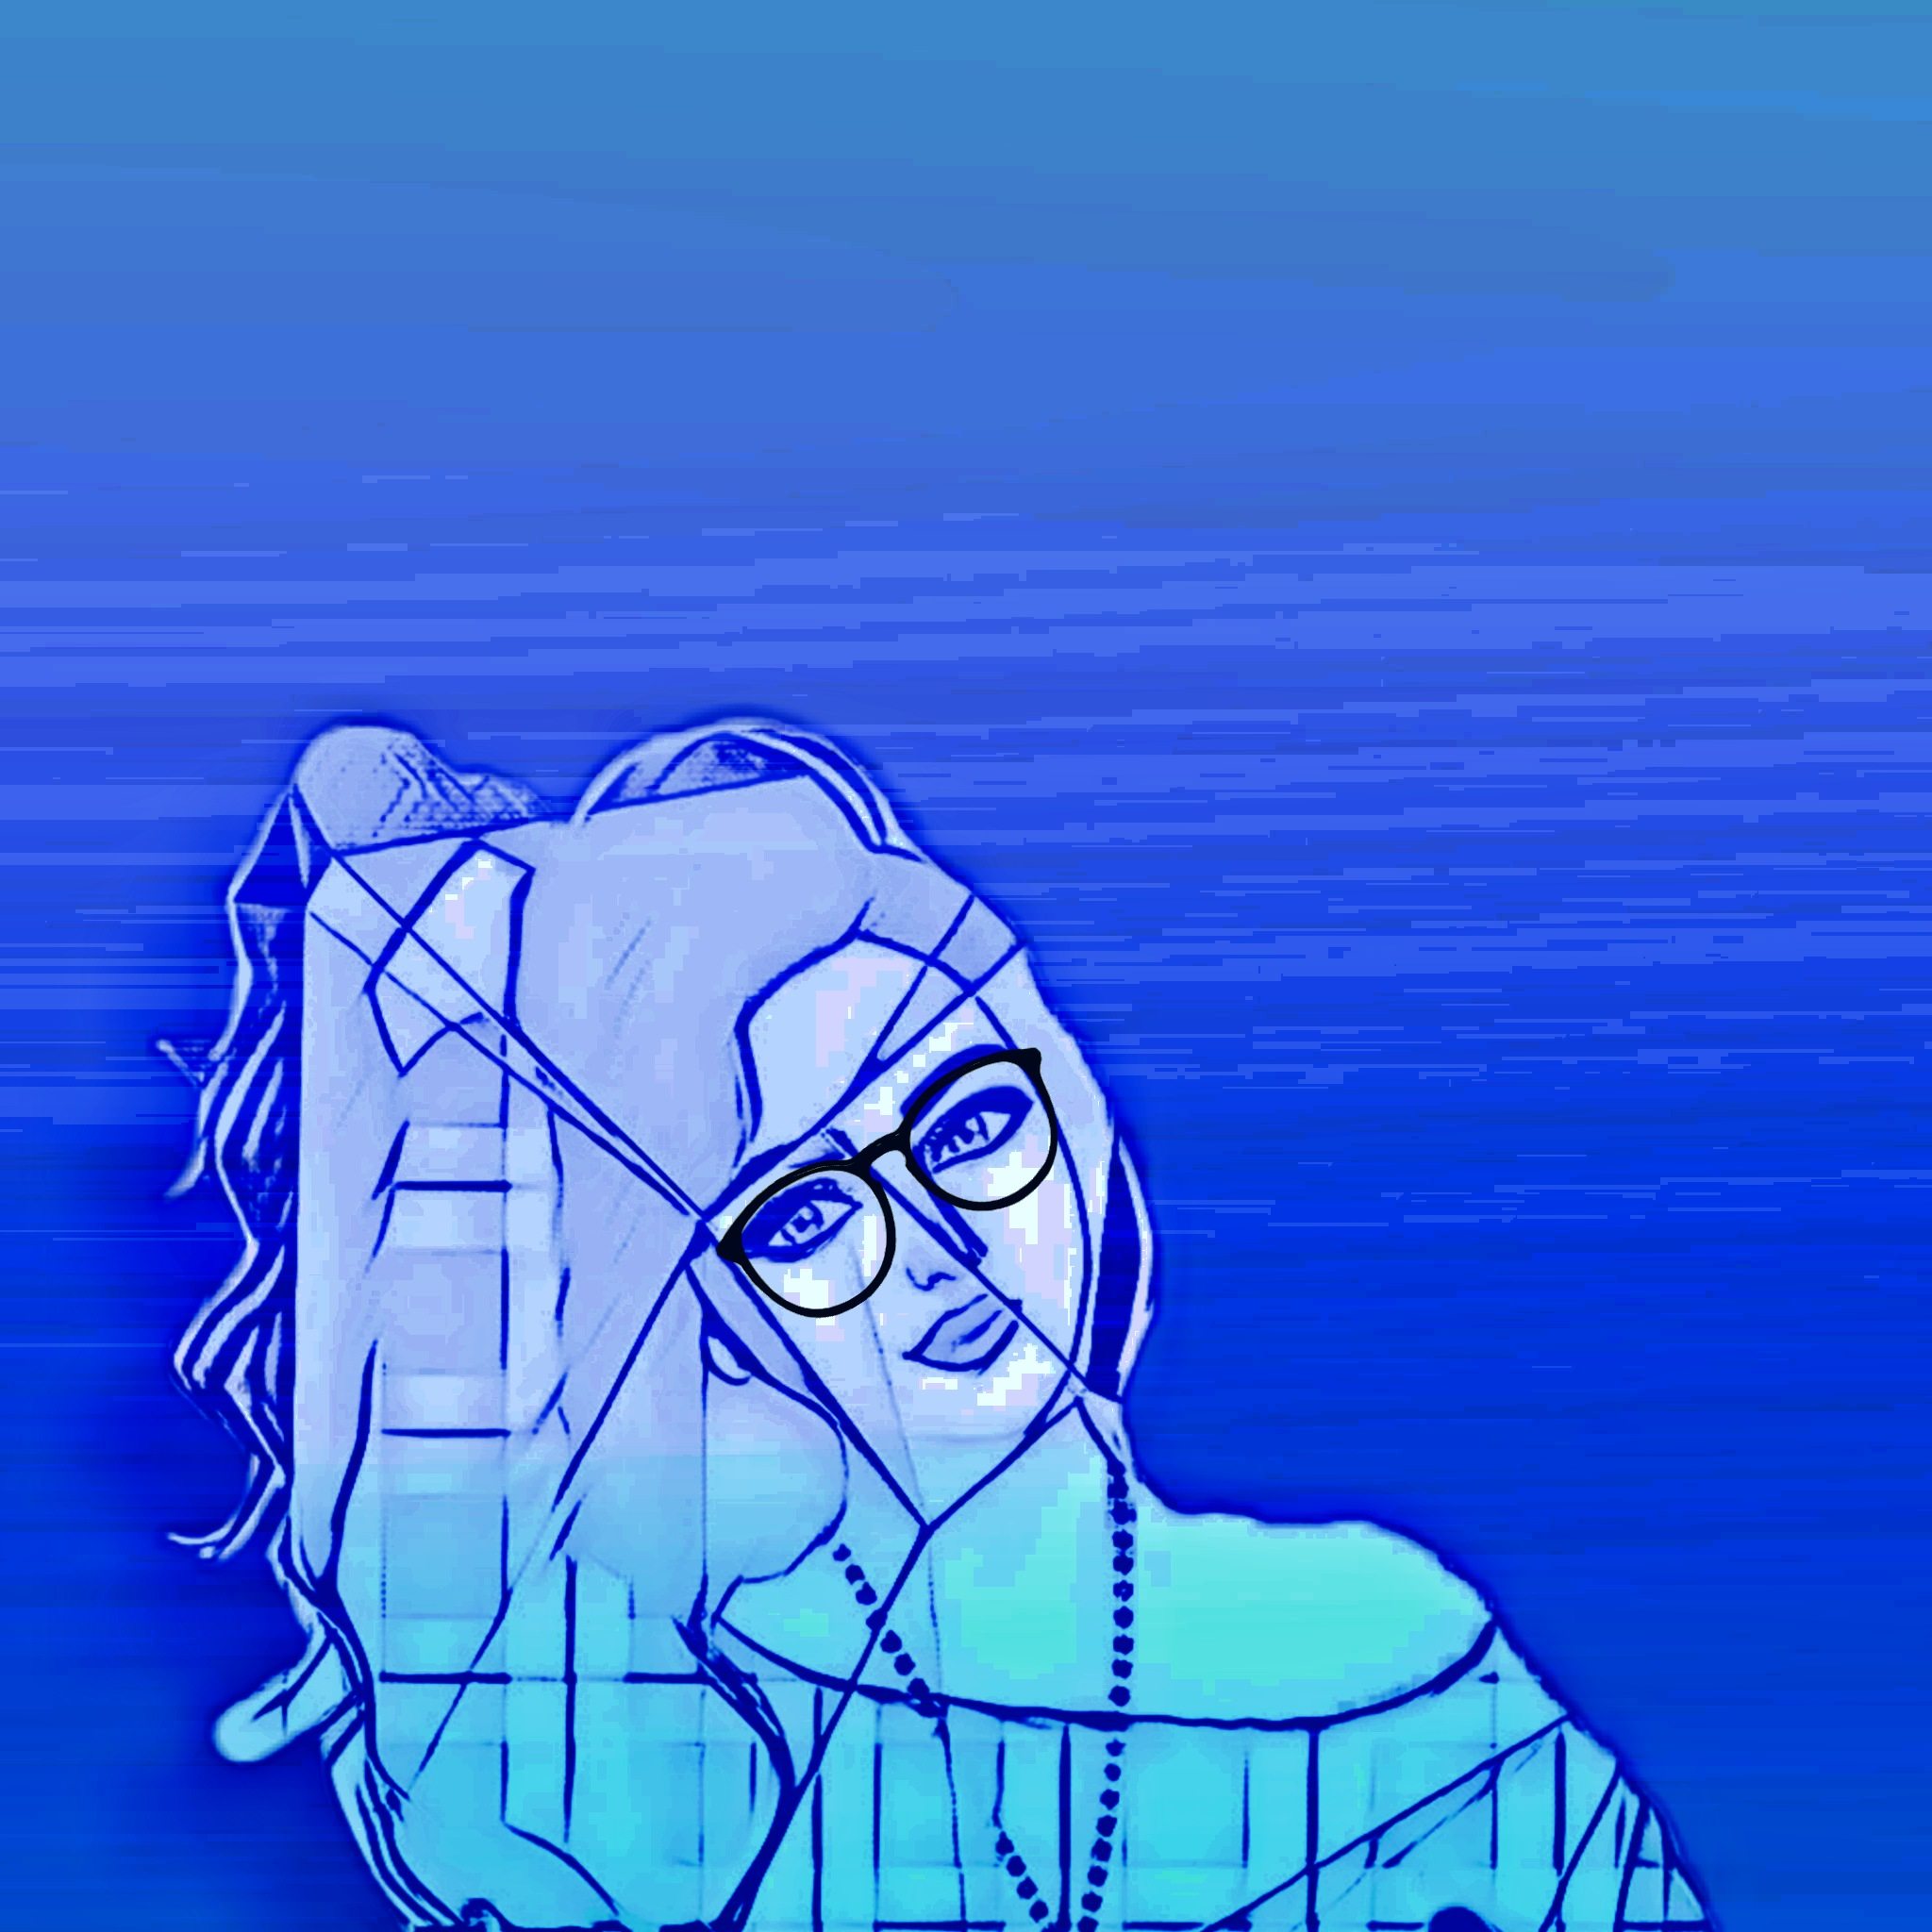 A girl's illustration